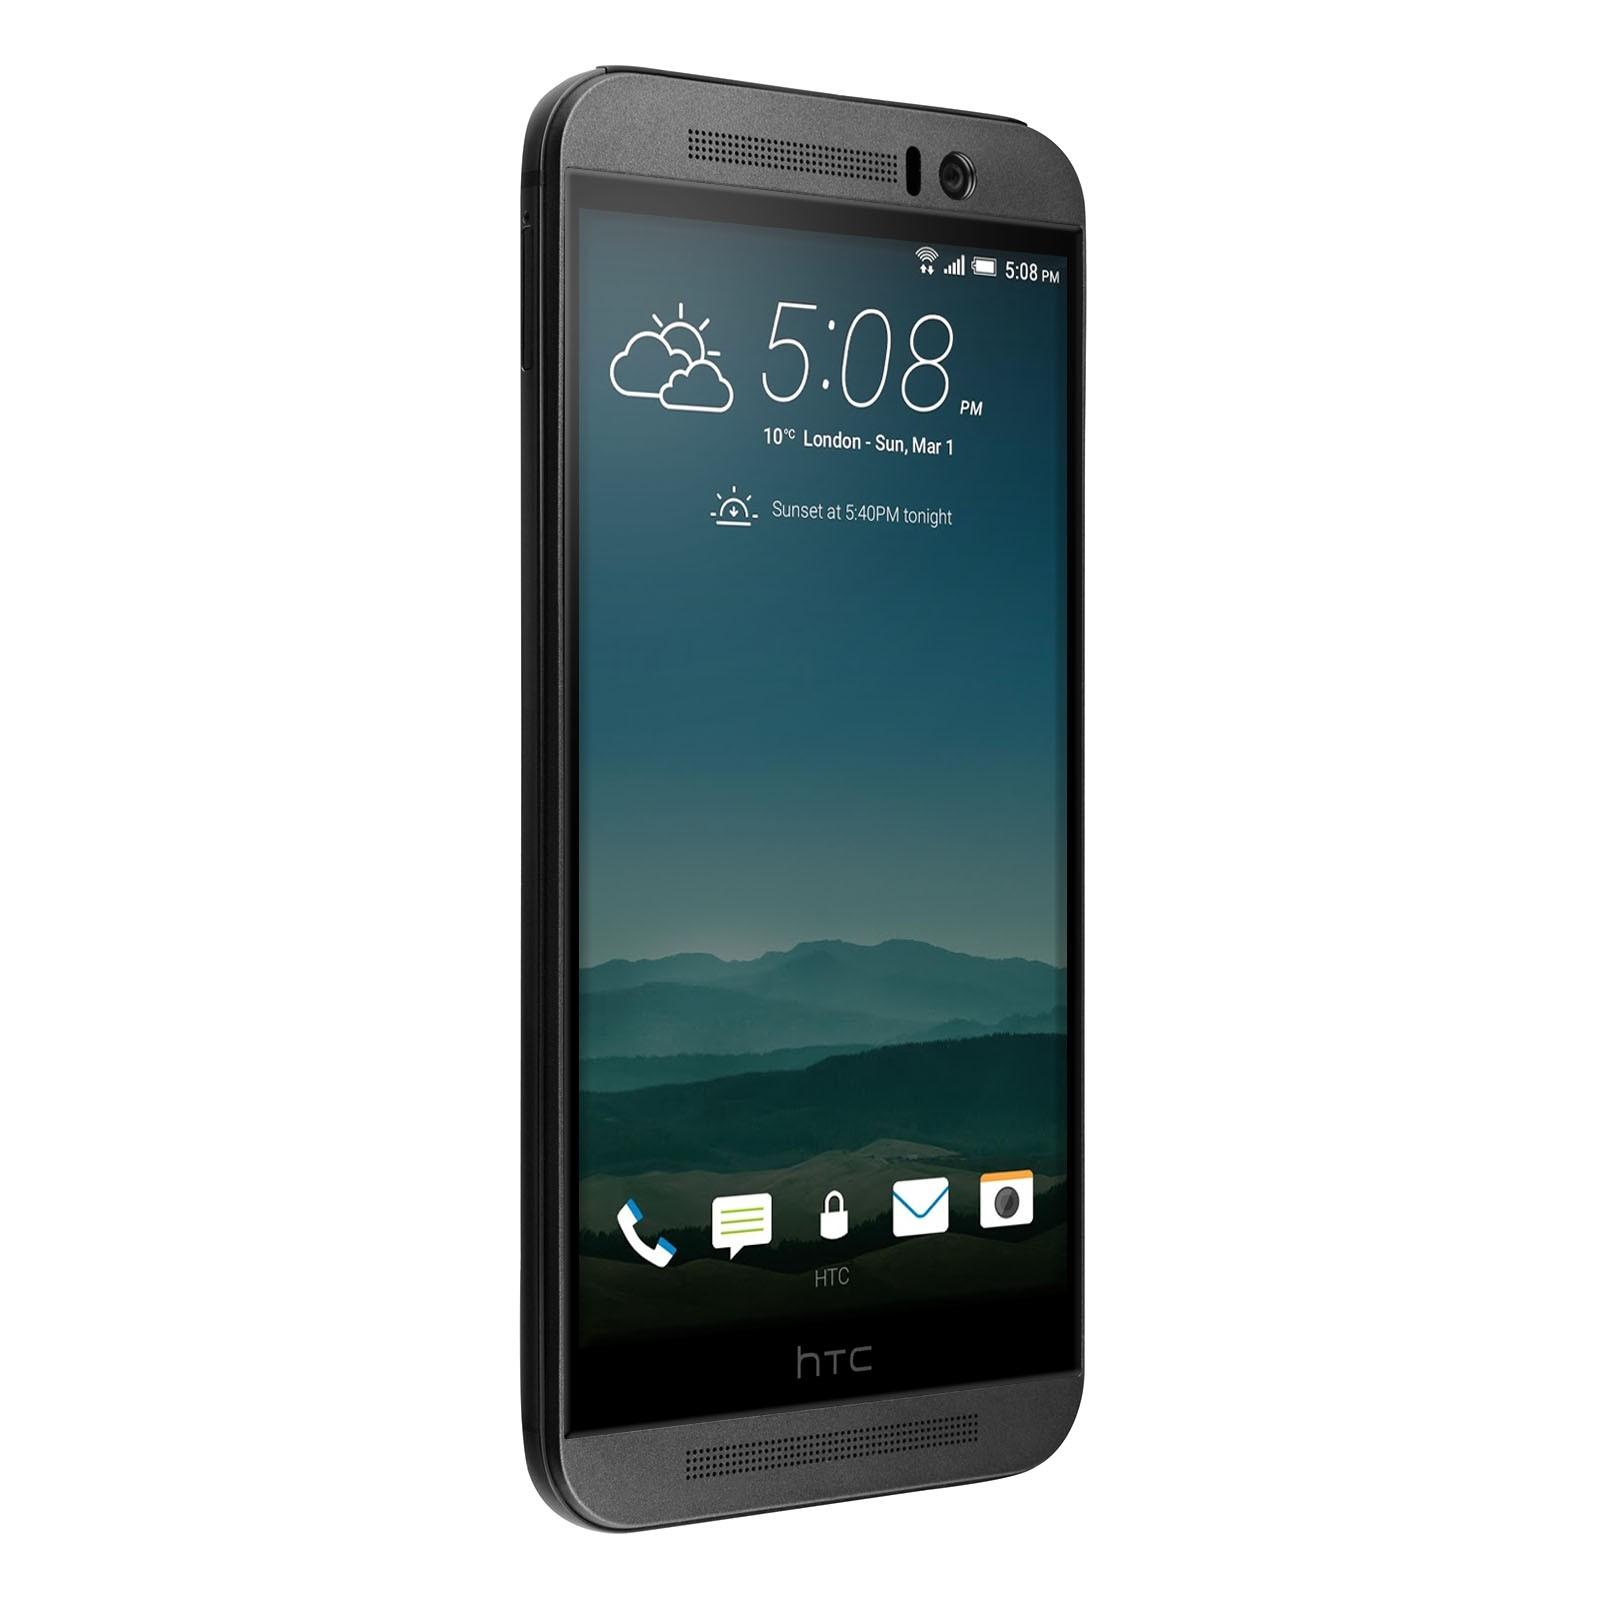 32GB HTC One M9  Sprint Unlocked Smartphone (refurb gray) $110 + free shipping